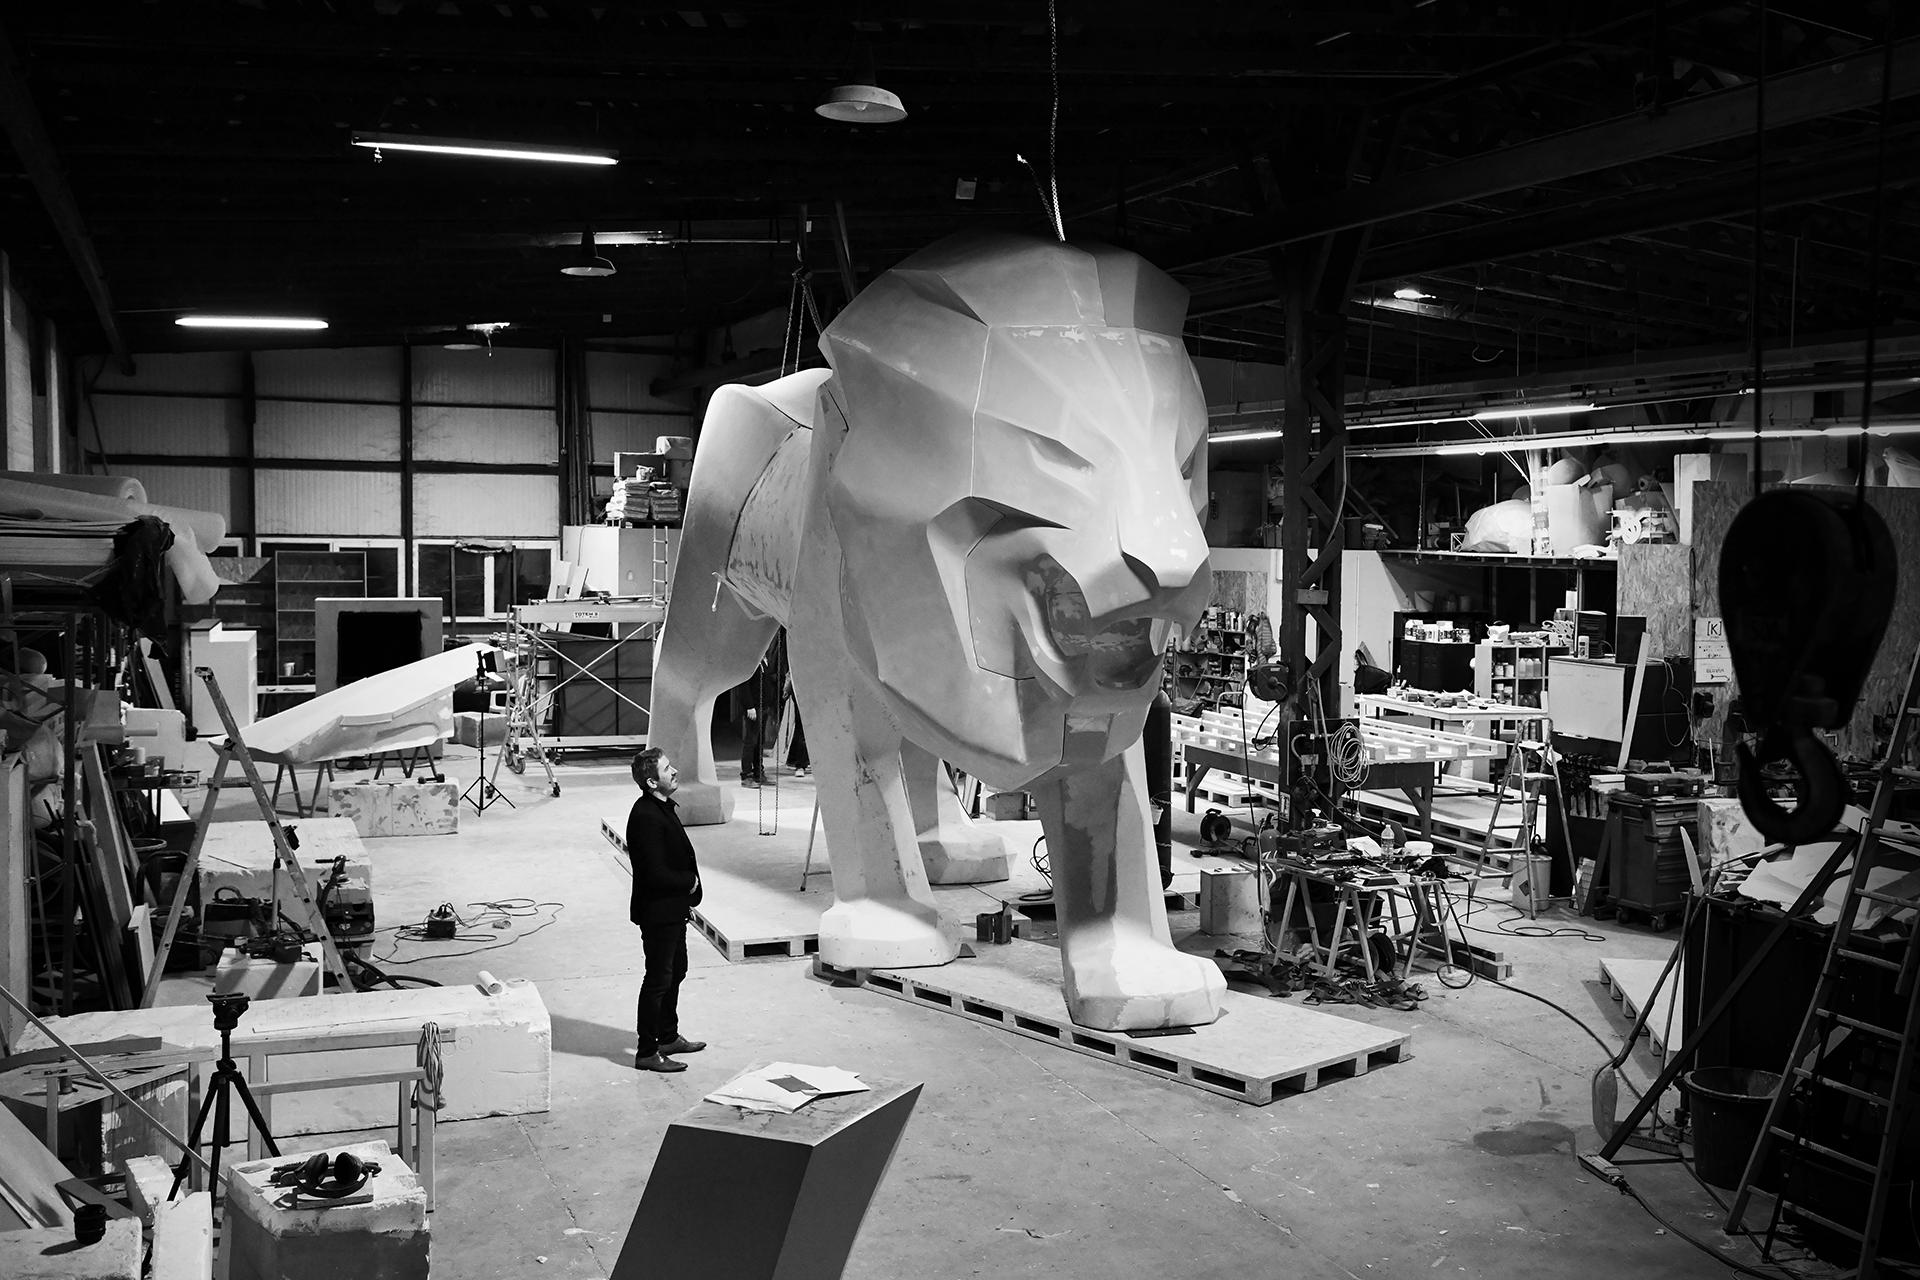 Peugeot prezentuje monumentalnego lwa